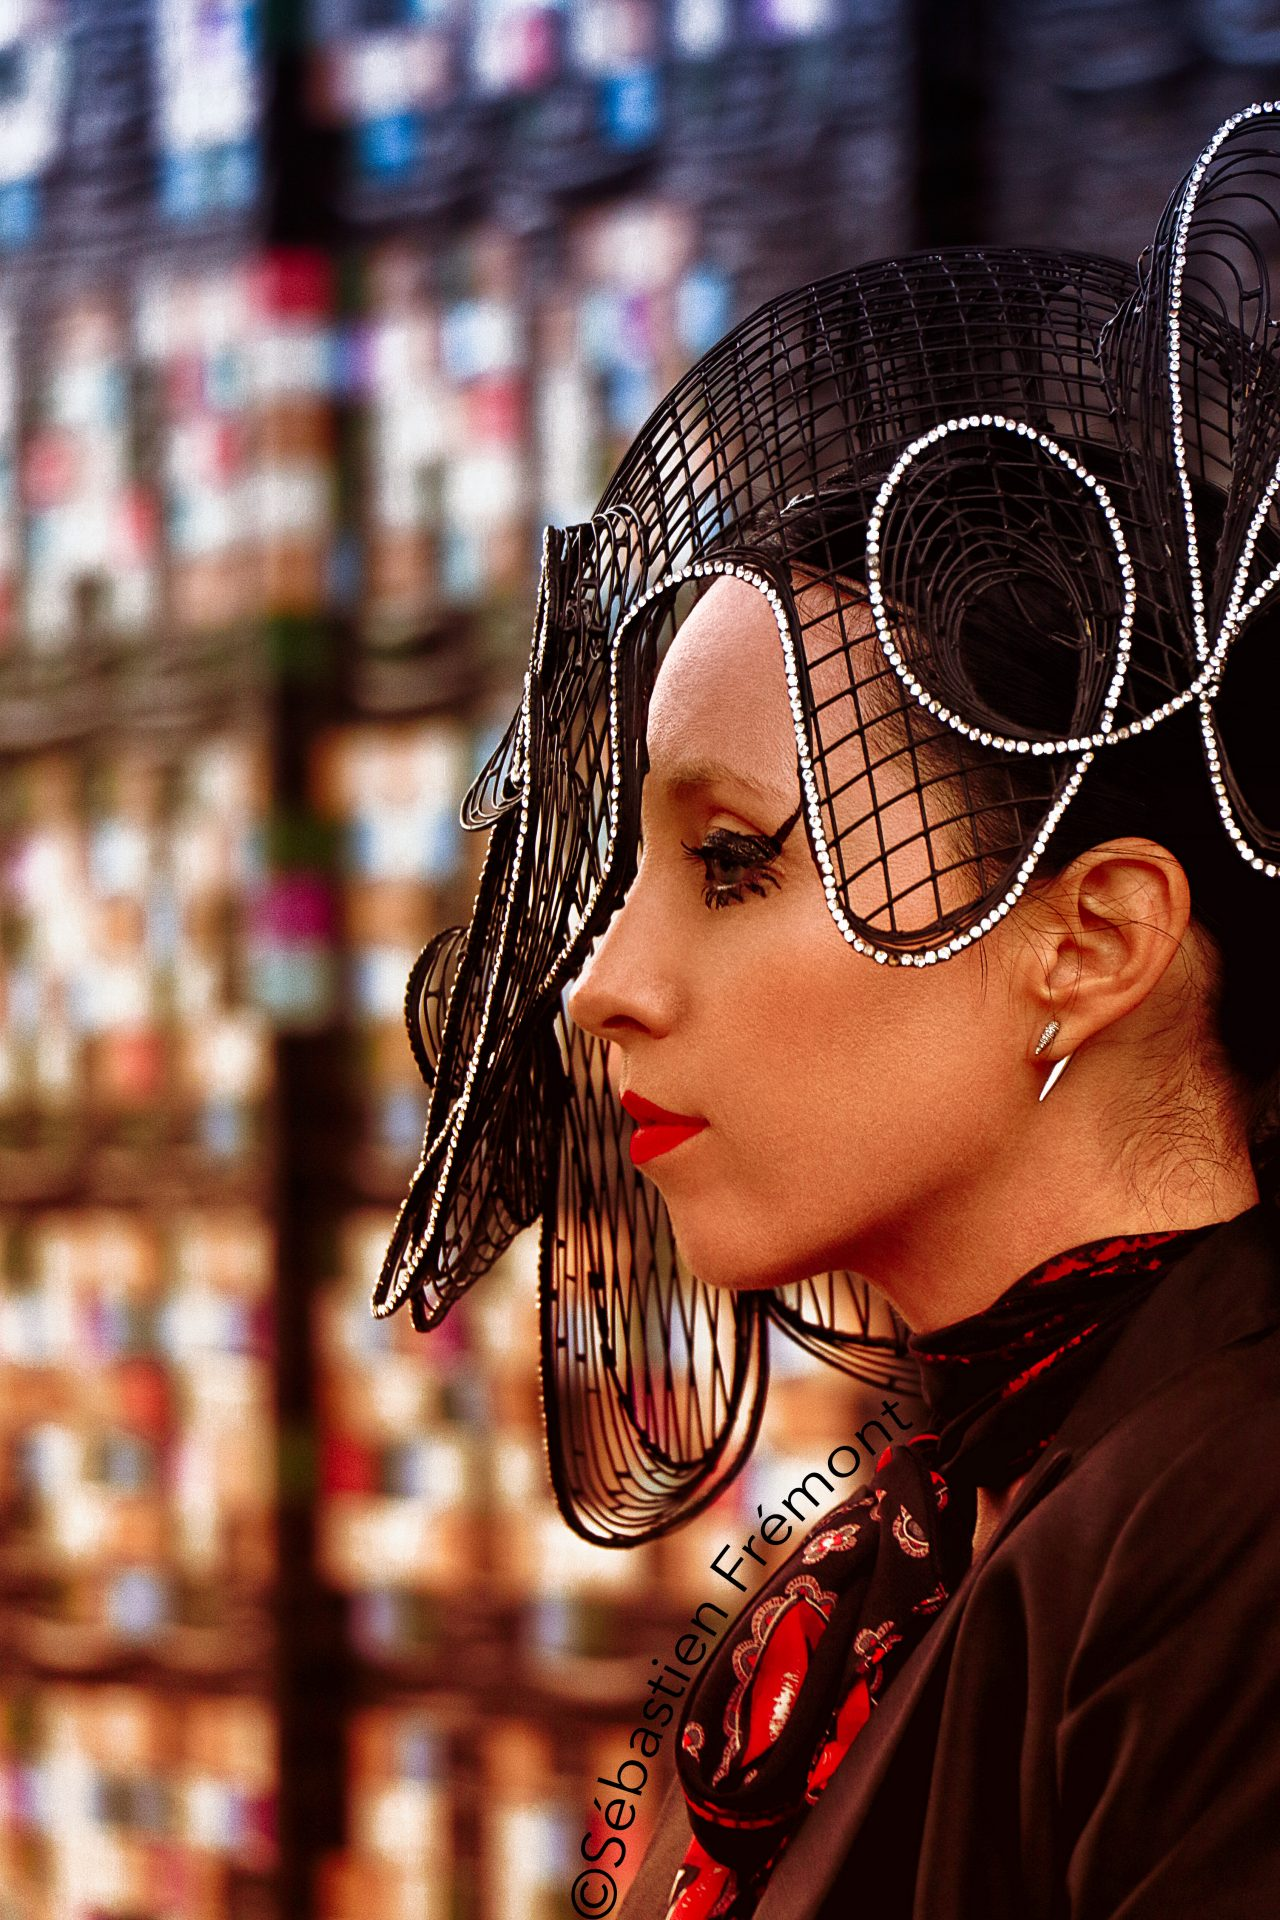 French Photographer Portrait Photography Model / Yang Li / Don't Kiss Me